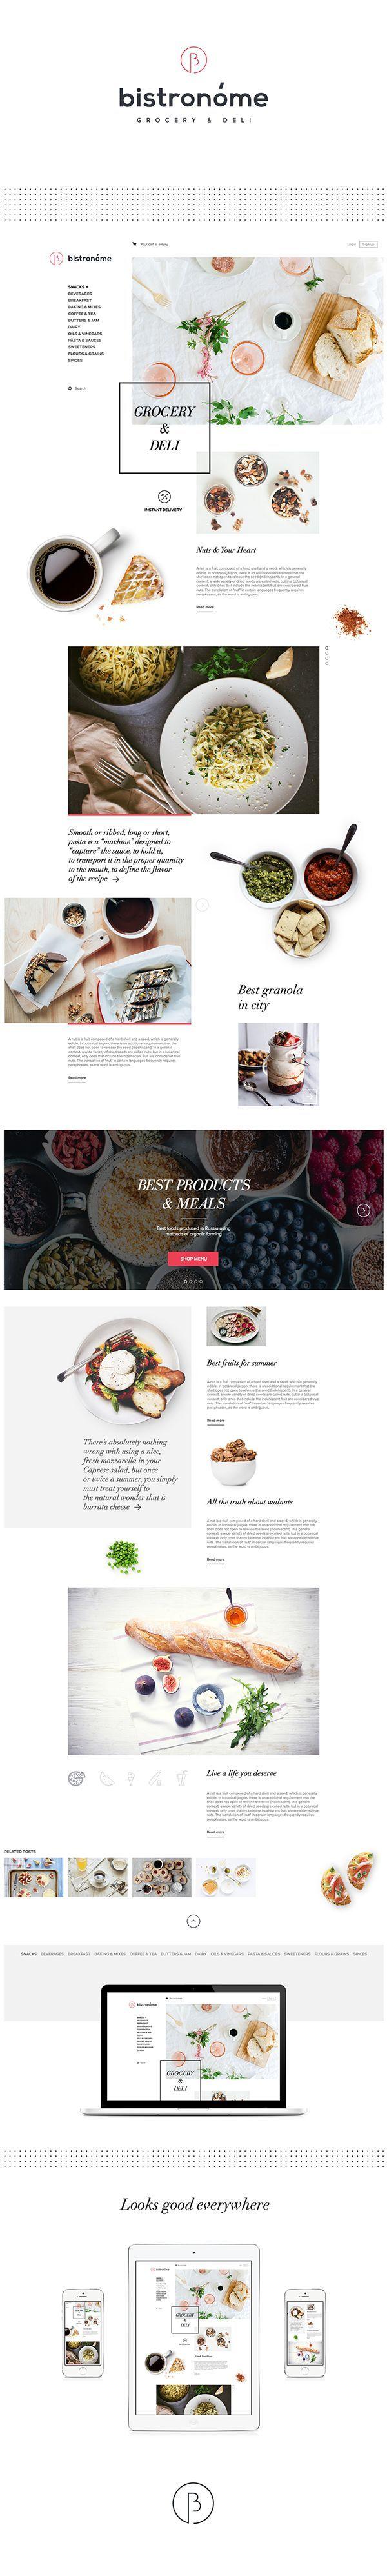 UI Design para a web | Dsignit – Graphics And Web